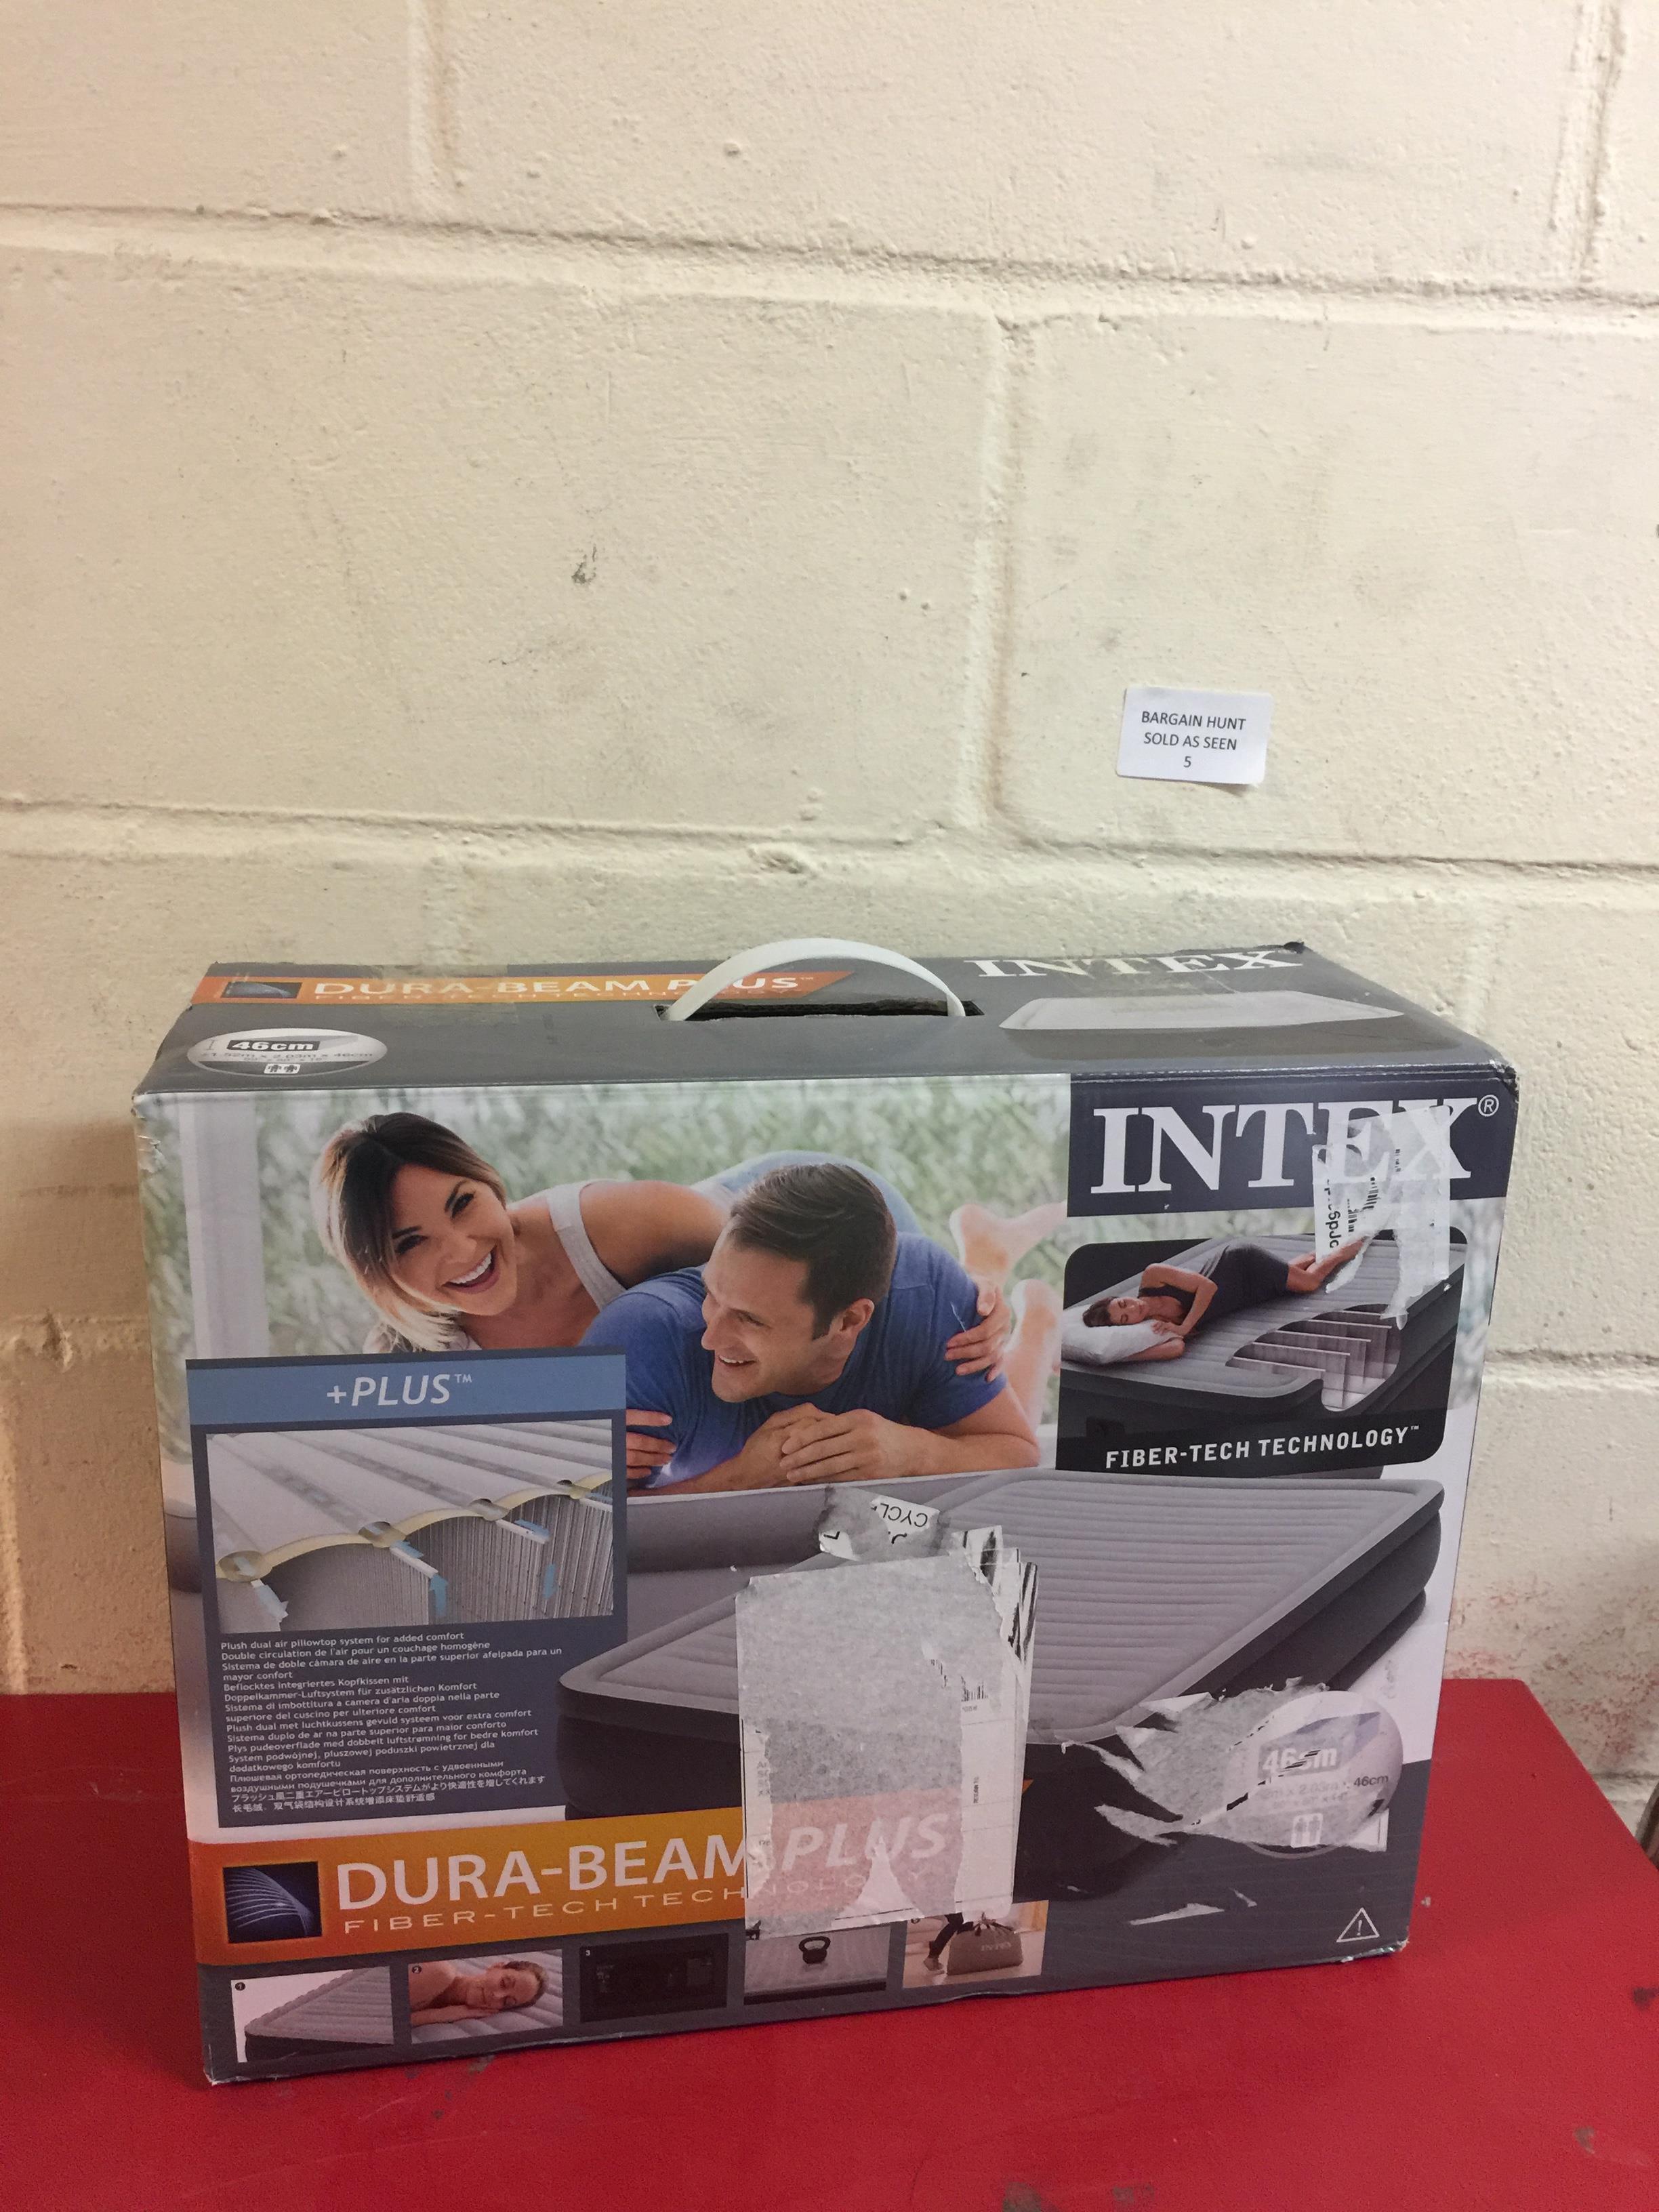 Lot 5 - Intex Unisex's Queen Dura Beam Series Elevated Airbed RRP £64.99